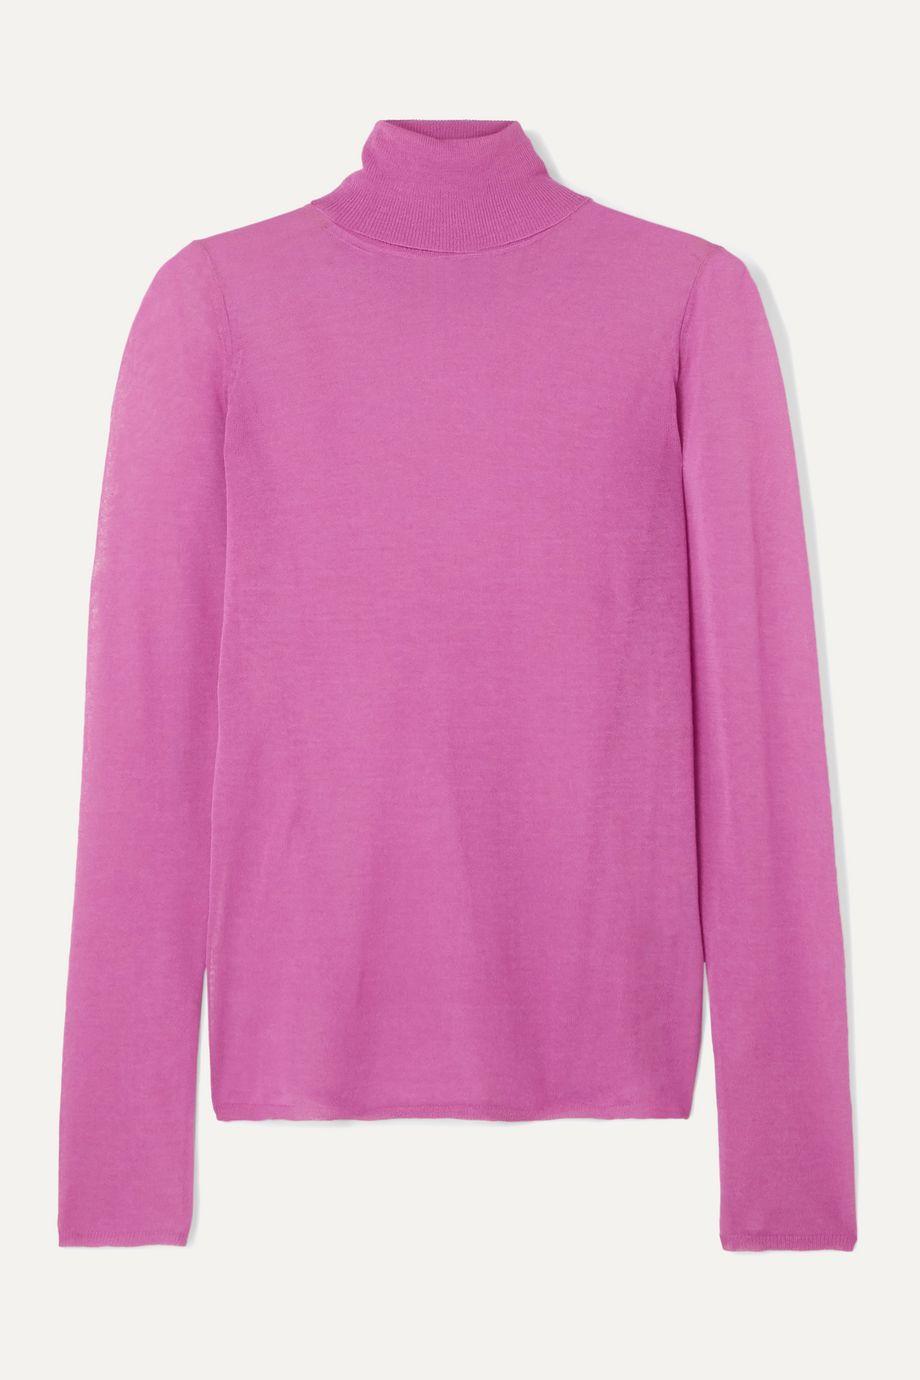 Isabel Marant Azale cotton-blend turtleneck sweater